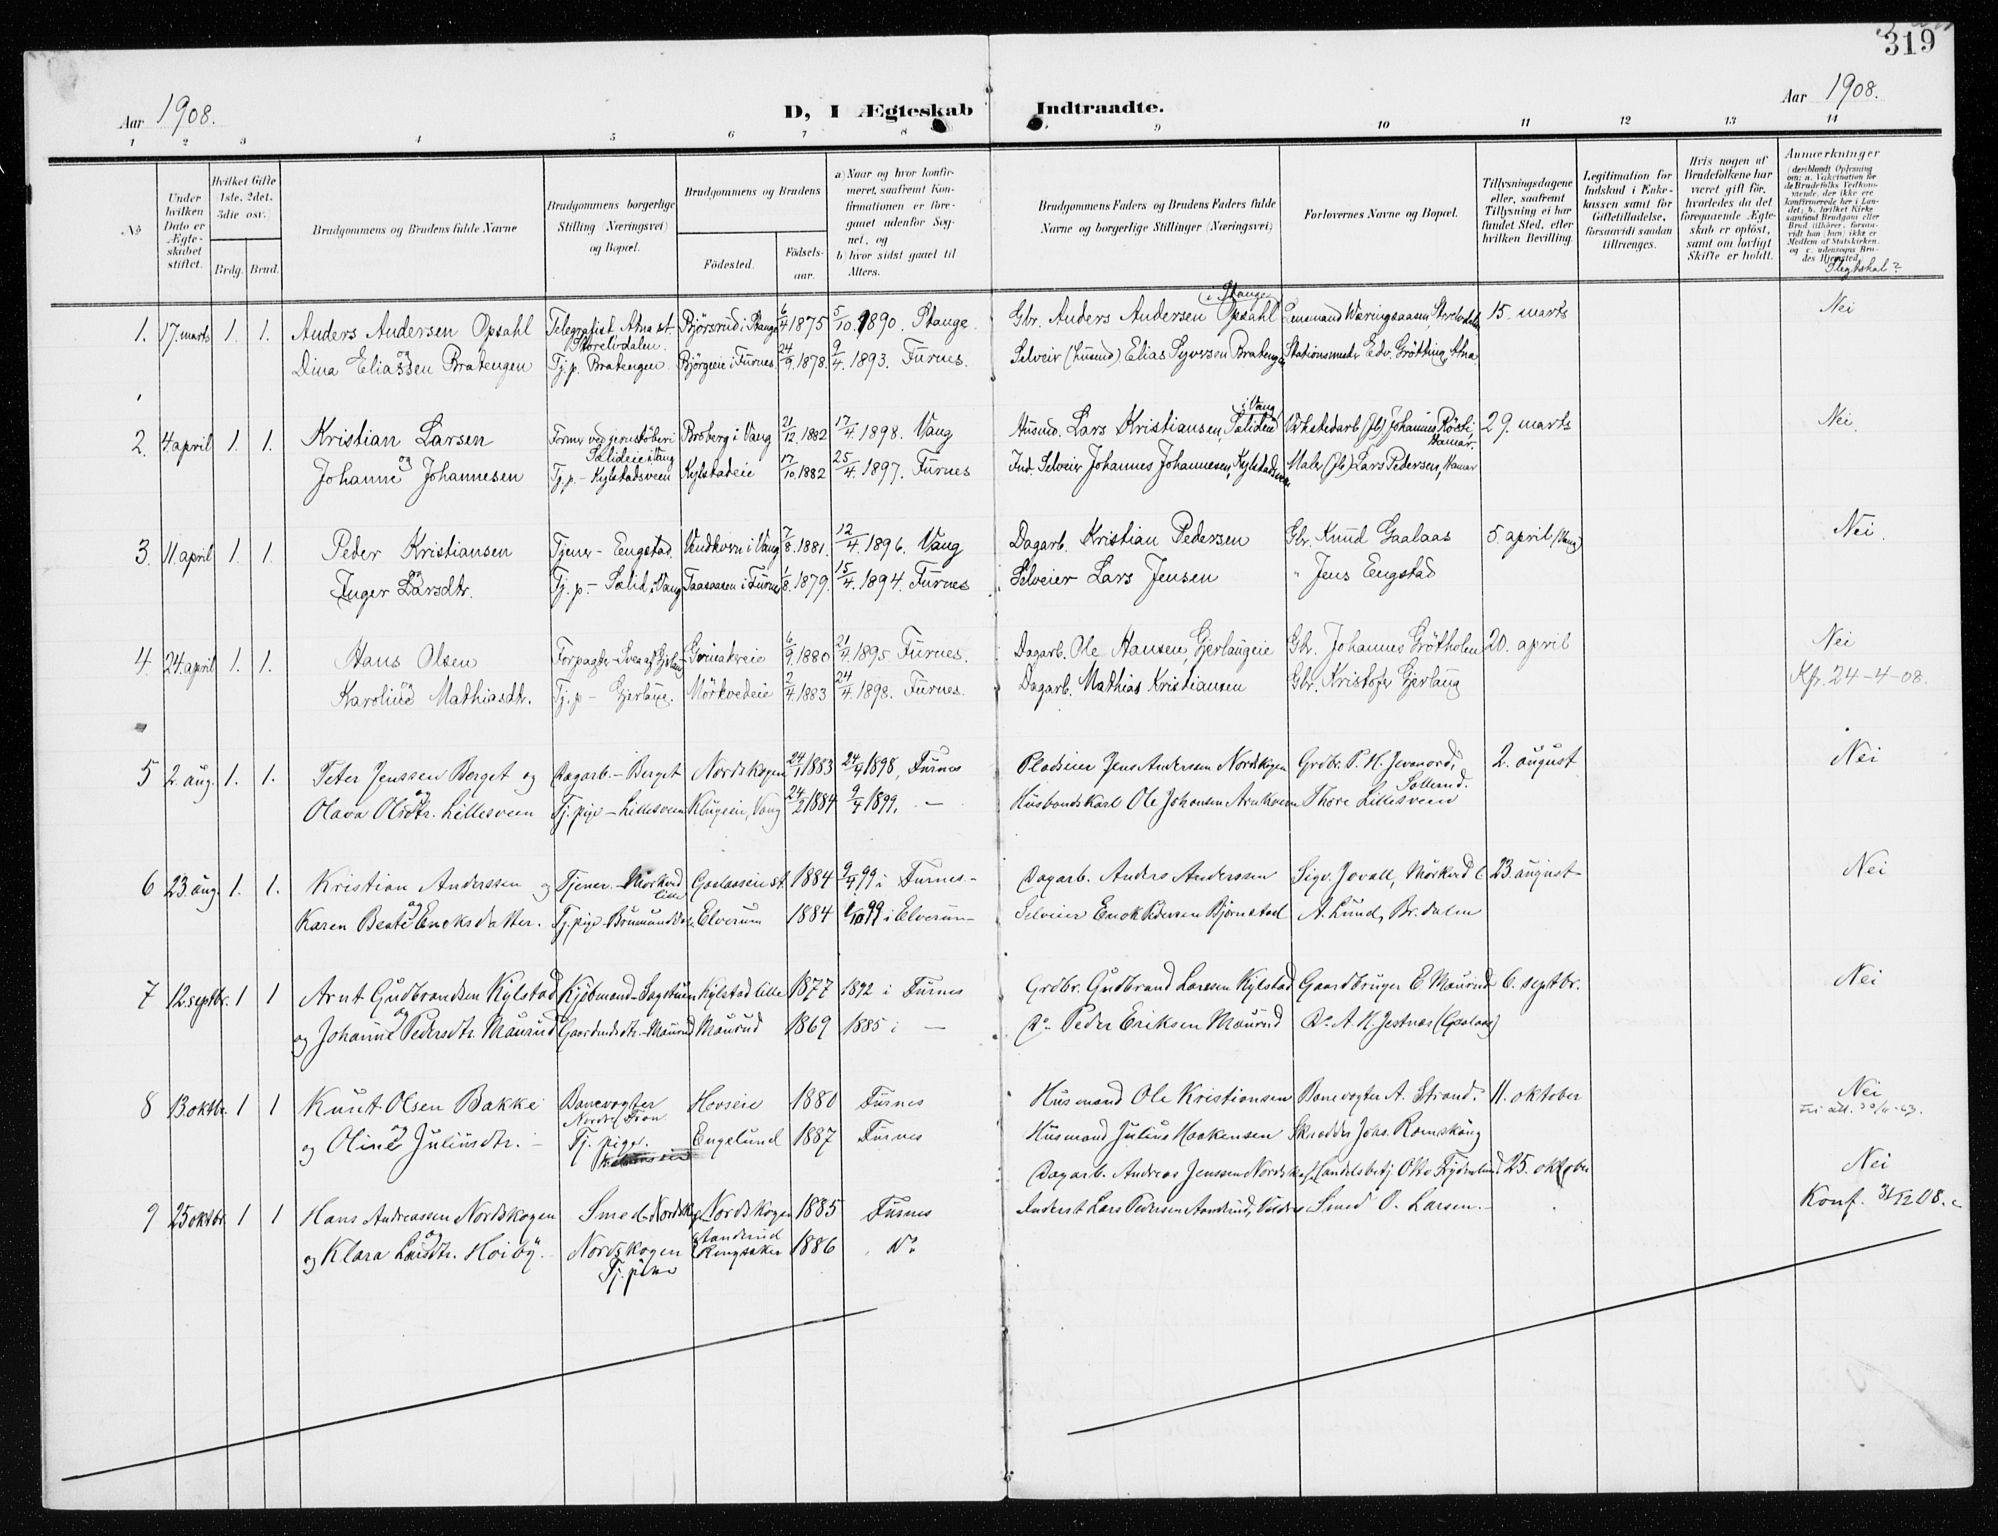 SAH, Furnes prestekontor, K/Ka/L0001: Ministerialbok nr. 1, 1907-1935, s. 319